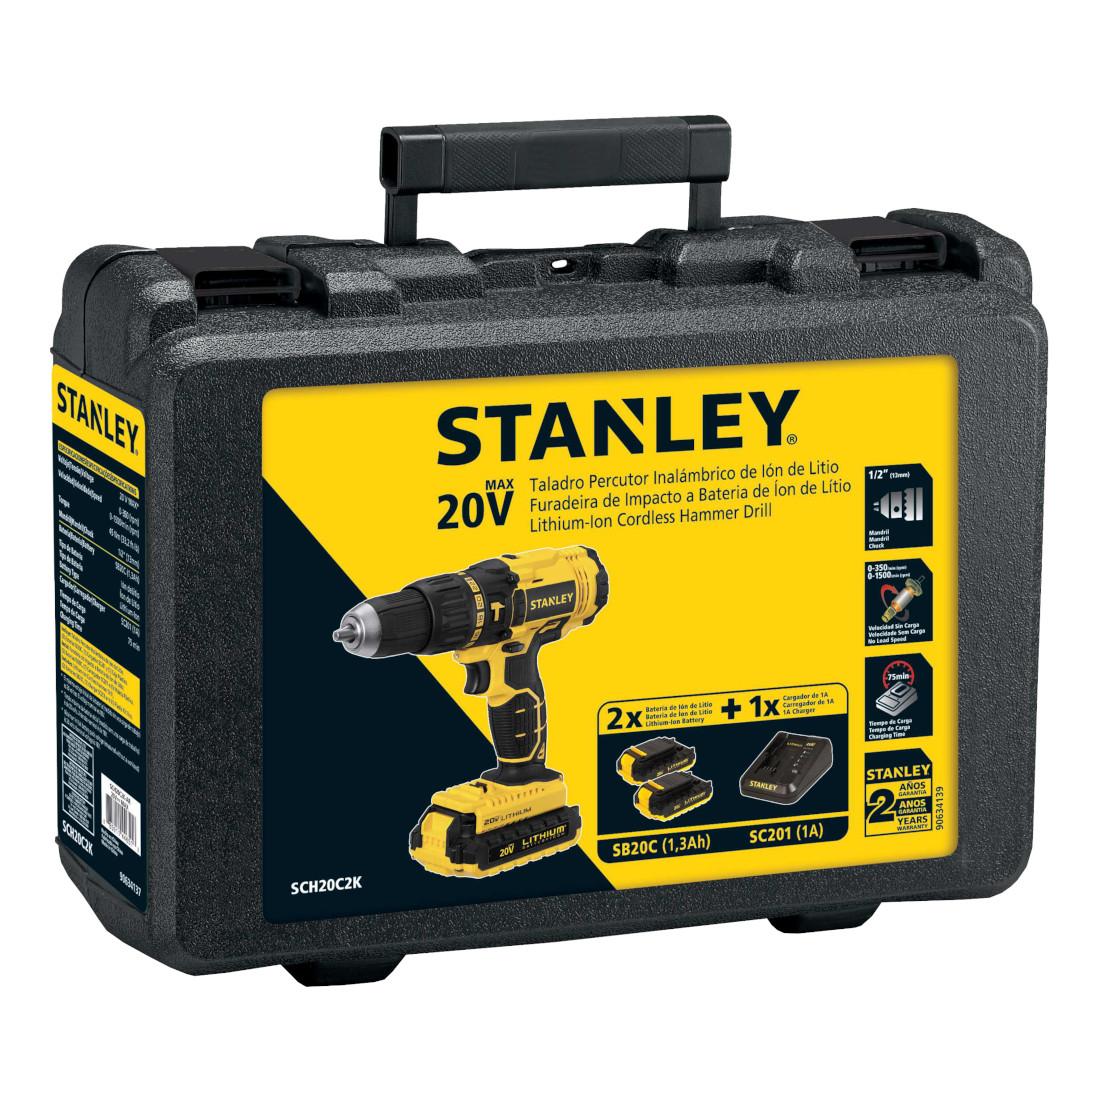 Parafusadeira e Furadeira de Impacto, 13mm, Maleta e 2 Baterias - STANLEY - SCH20C2K